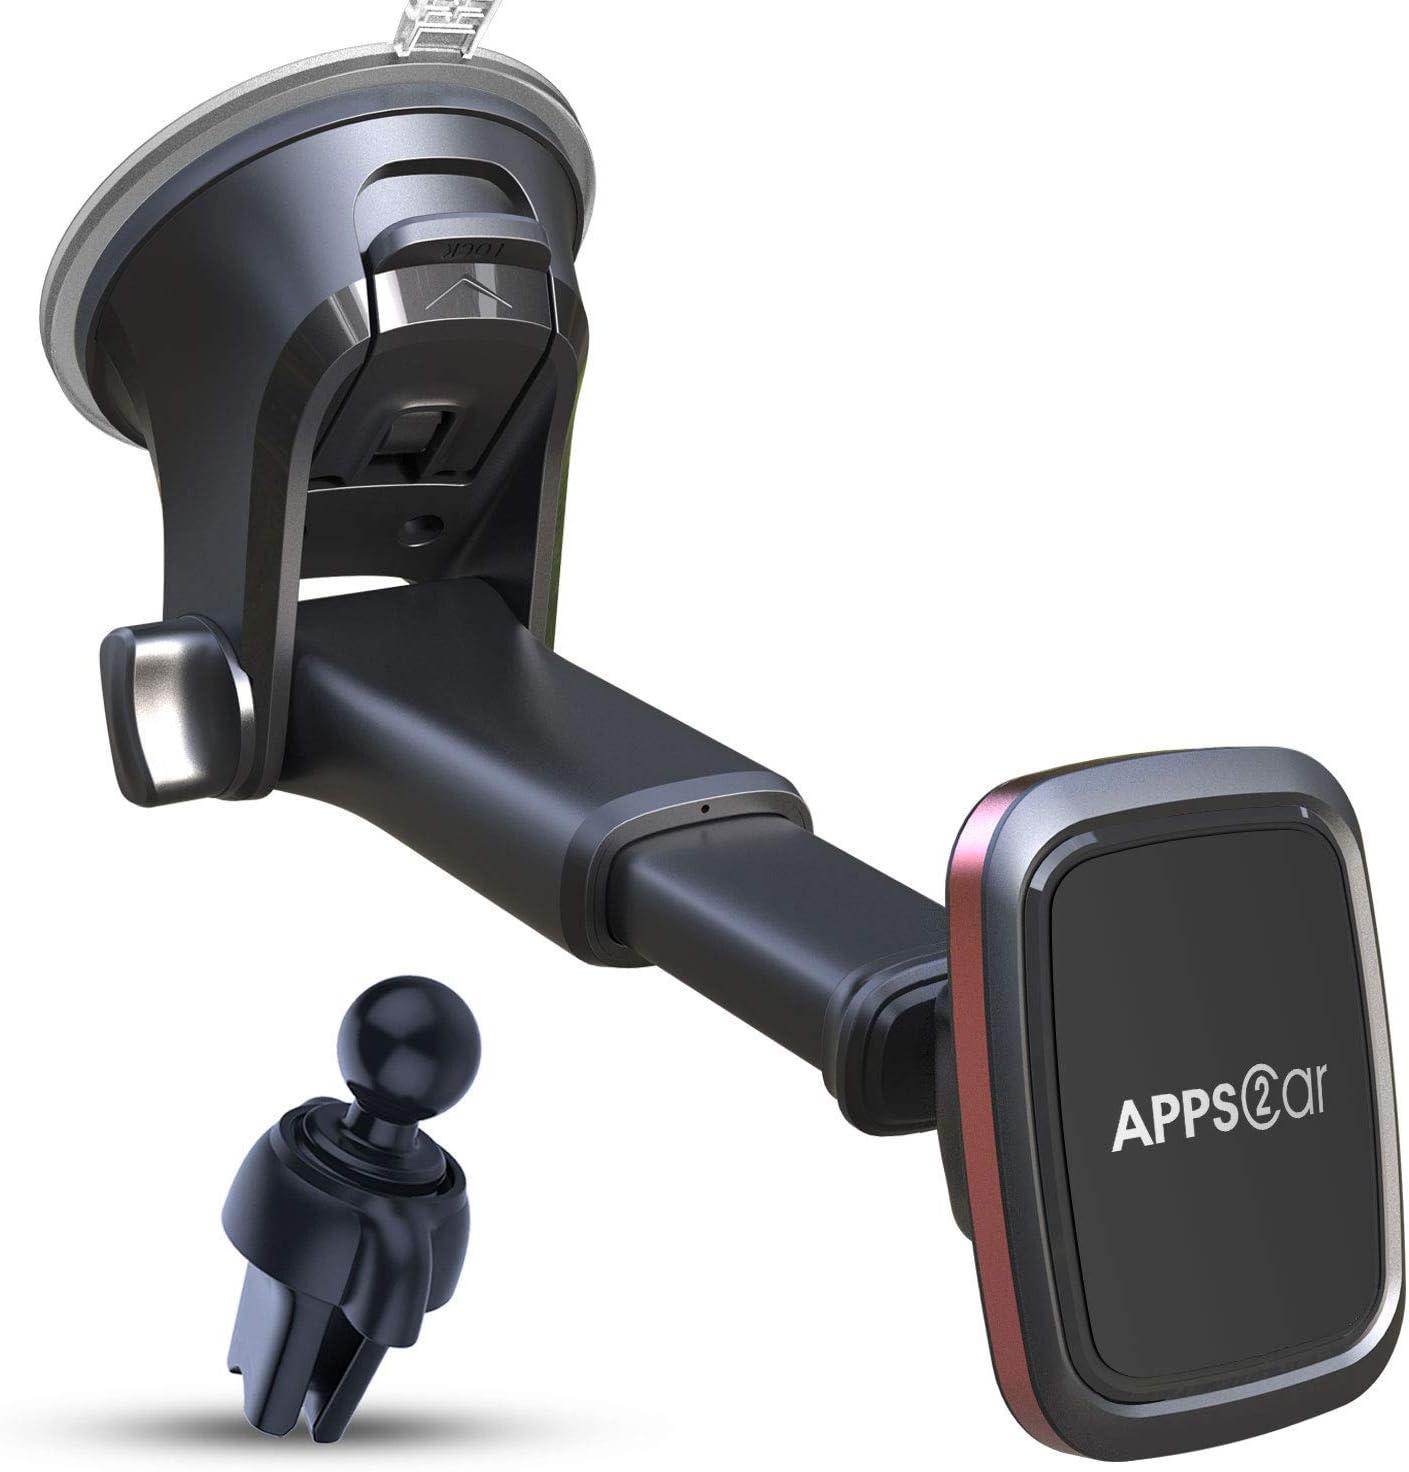 Car Phone Mount Holders 2 Pack Alquar 360/° Rotation Universal Stick on Dashboard for GPS Navigation 4351484832